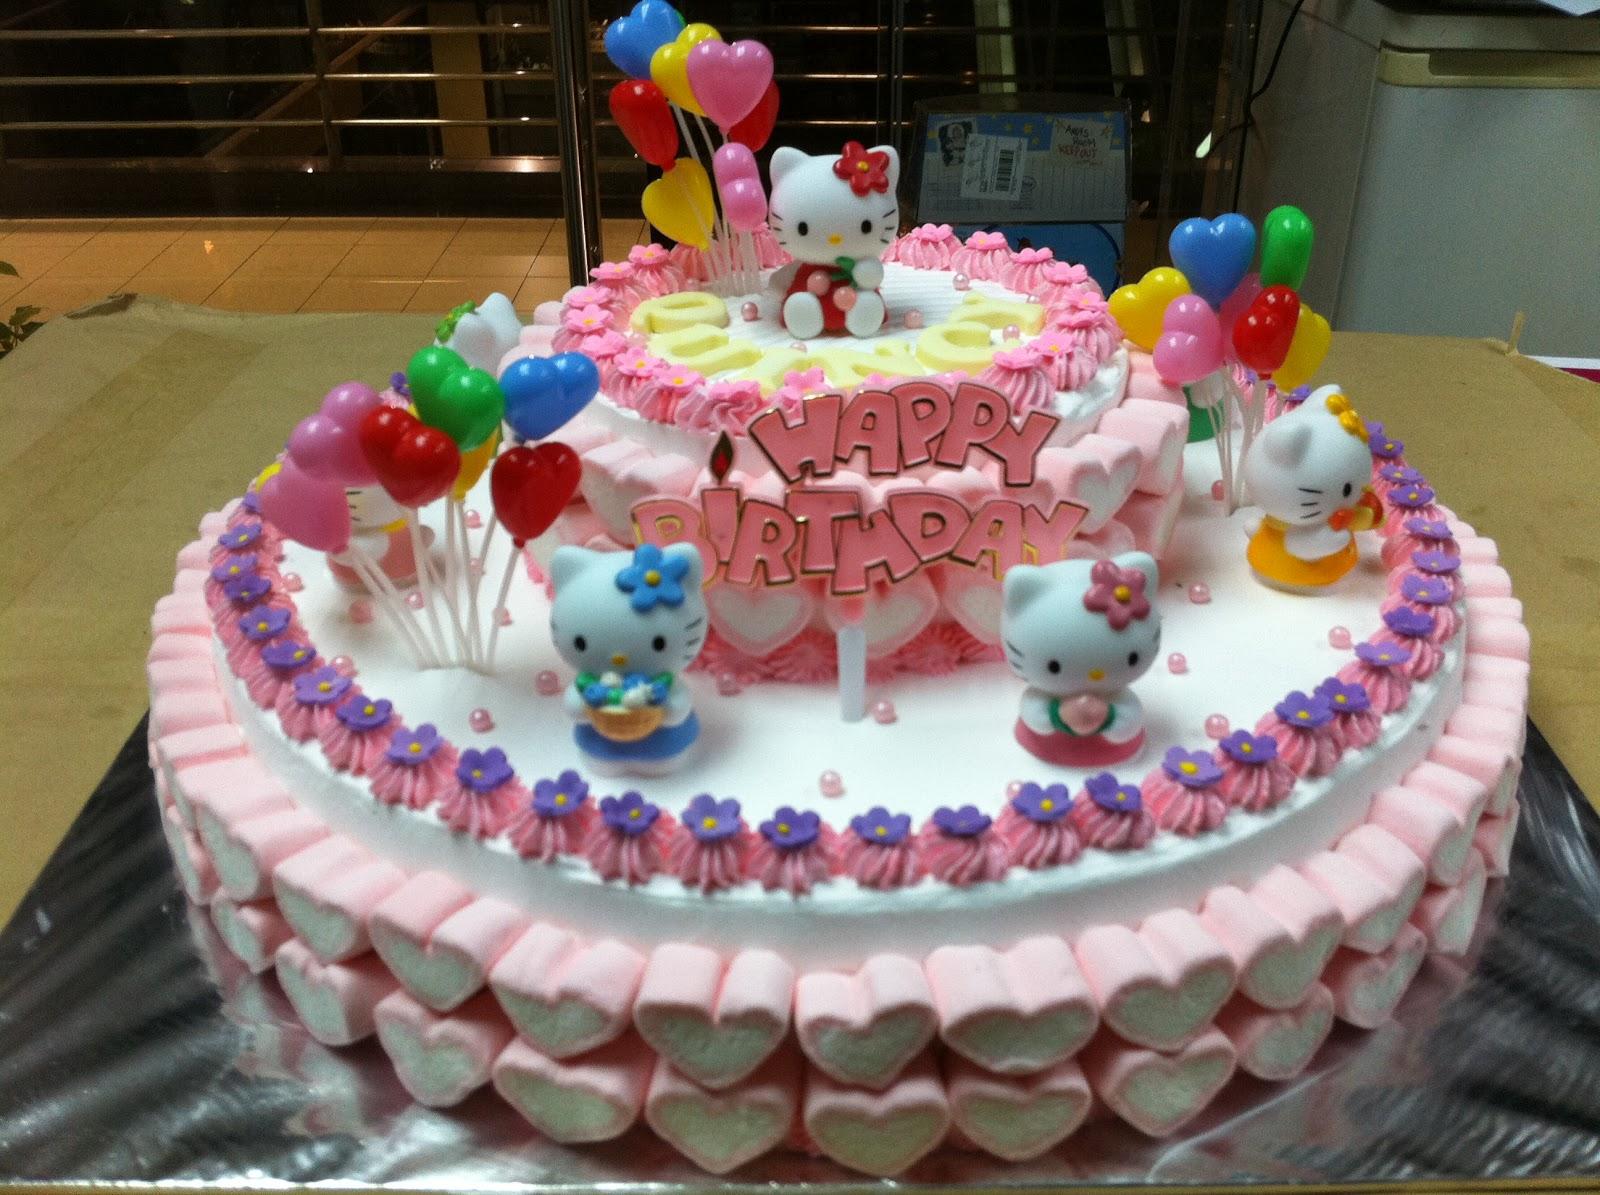 Cake Designs For Children S Birthday : Walmart Bakery Birthday Cake Ideas and Designs